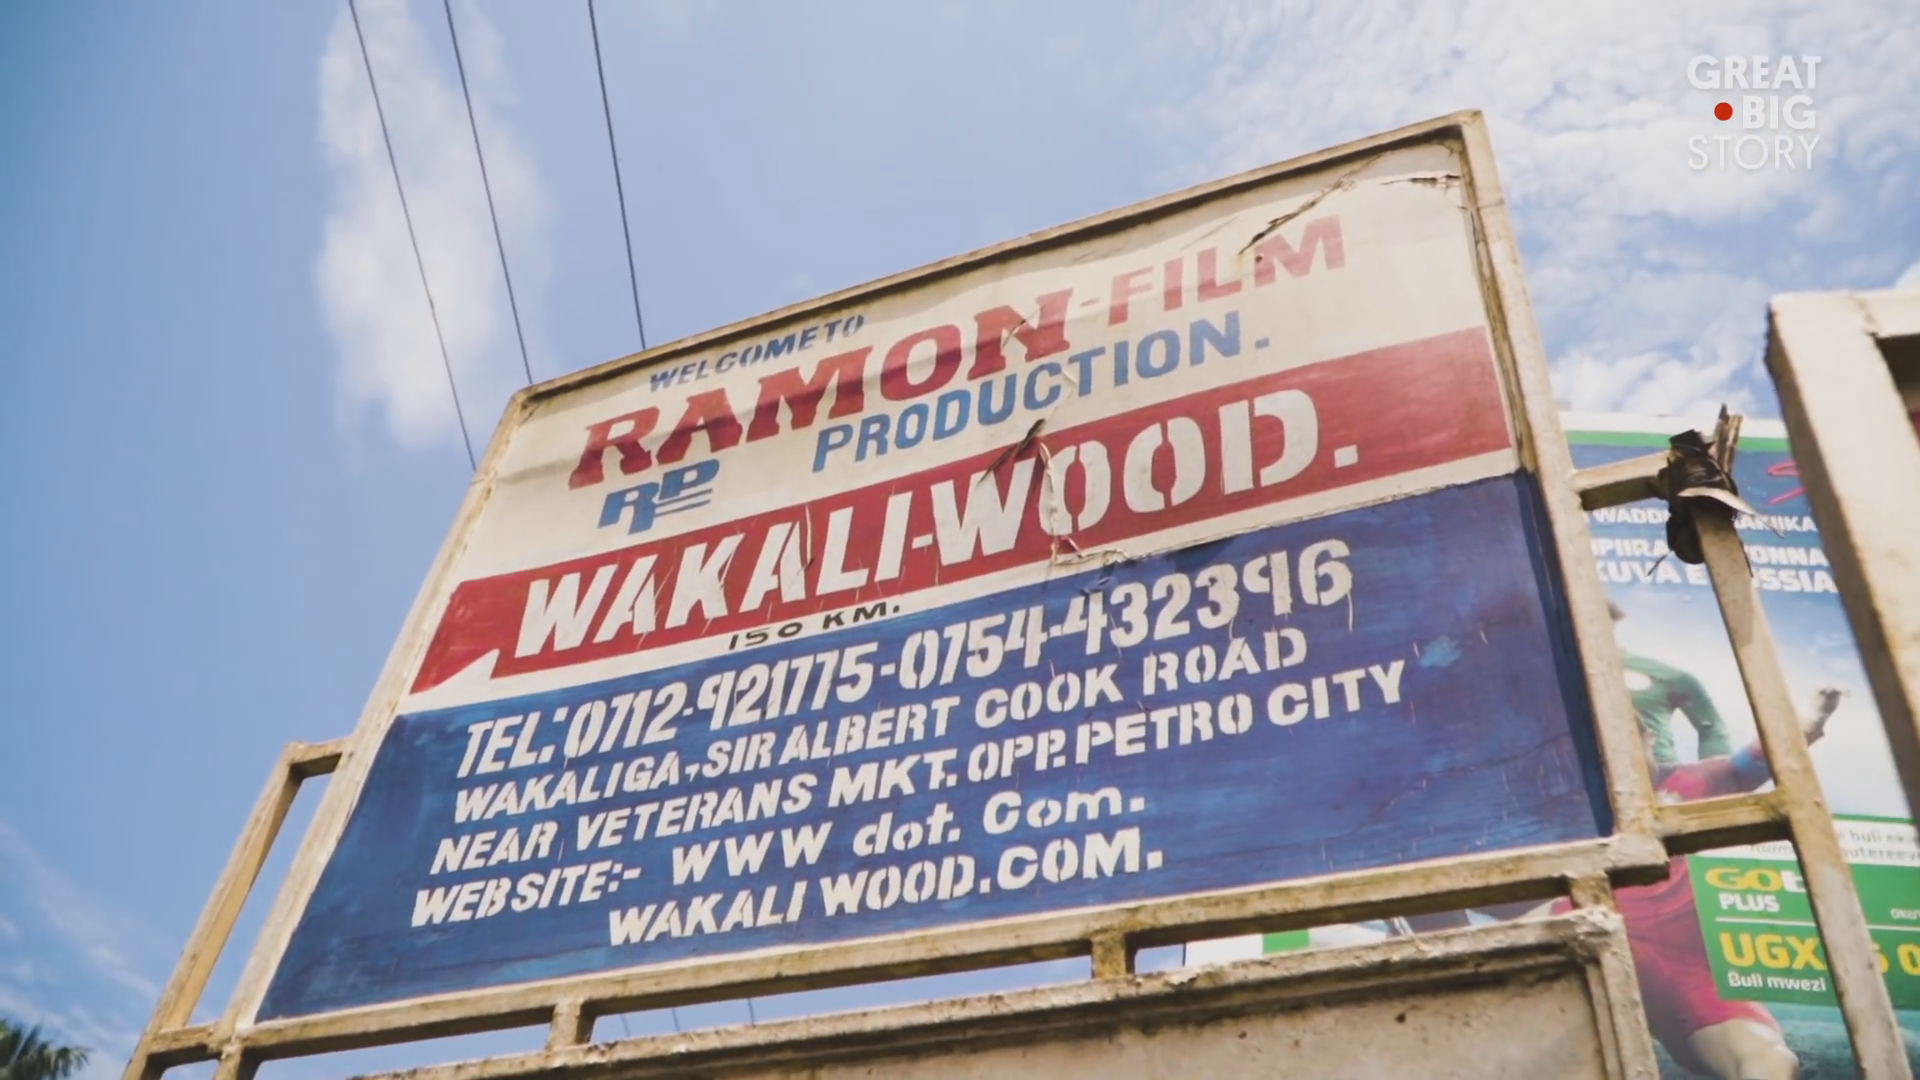 Wakaliwood sign